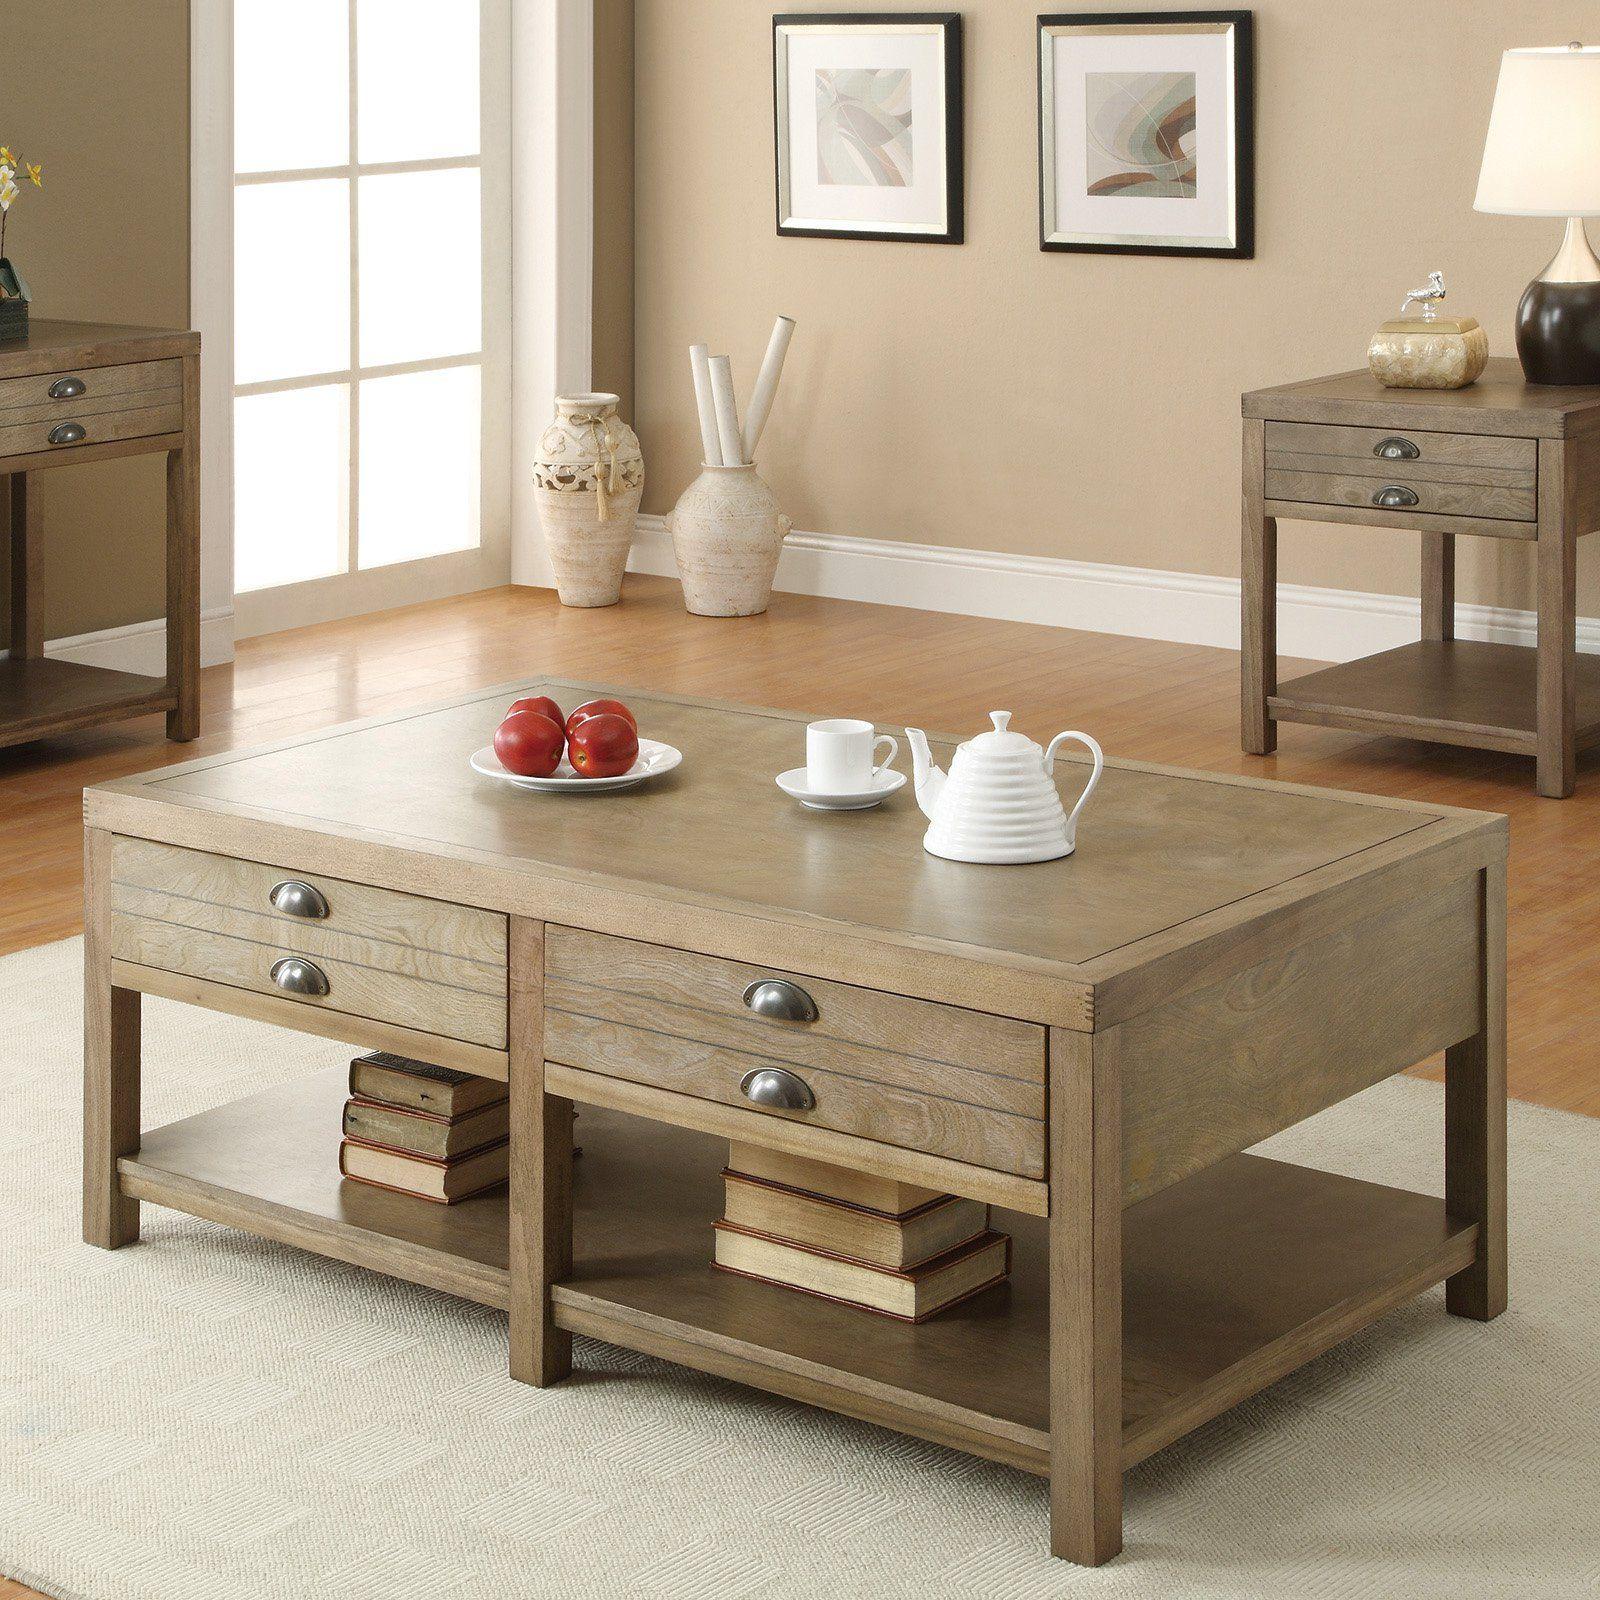 Coaster Furniture Light Oak Coffee Table Coffee Table Home Coffee Tables Coffee Table With Drawers [ 1600 x 1600 Pixel ]